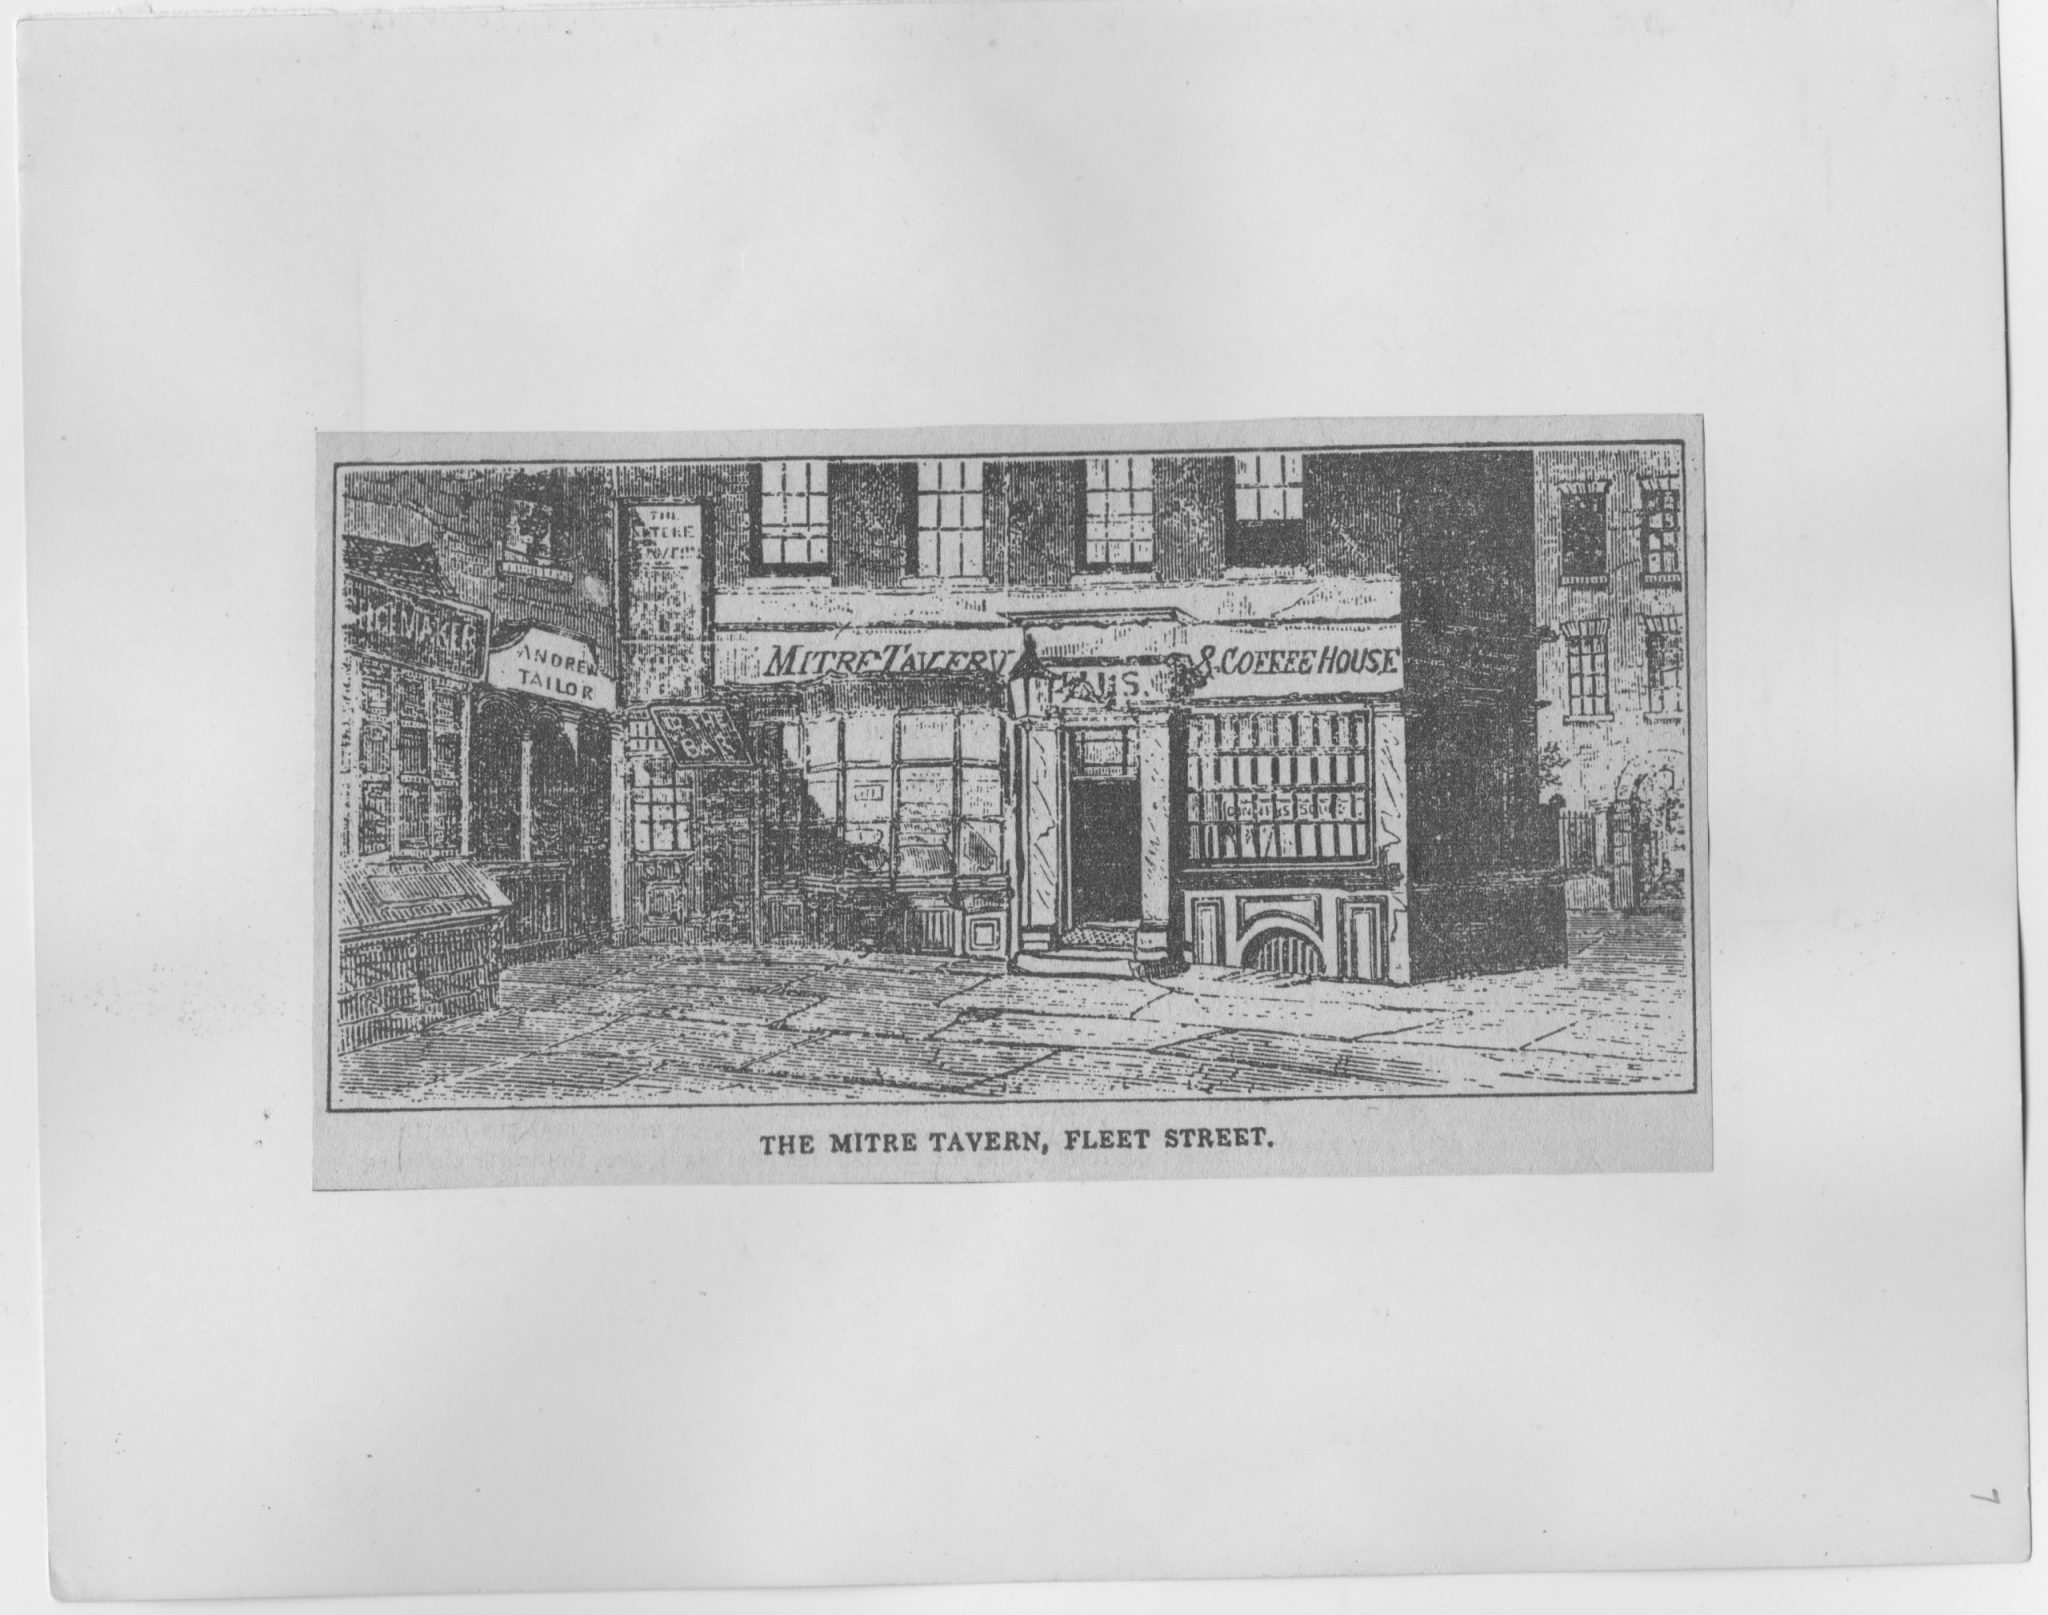 Victorian drawing of The Mitre Tavern Fleet Street London